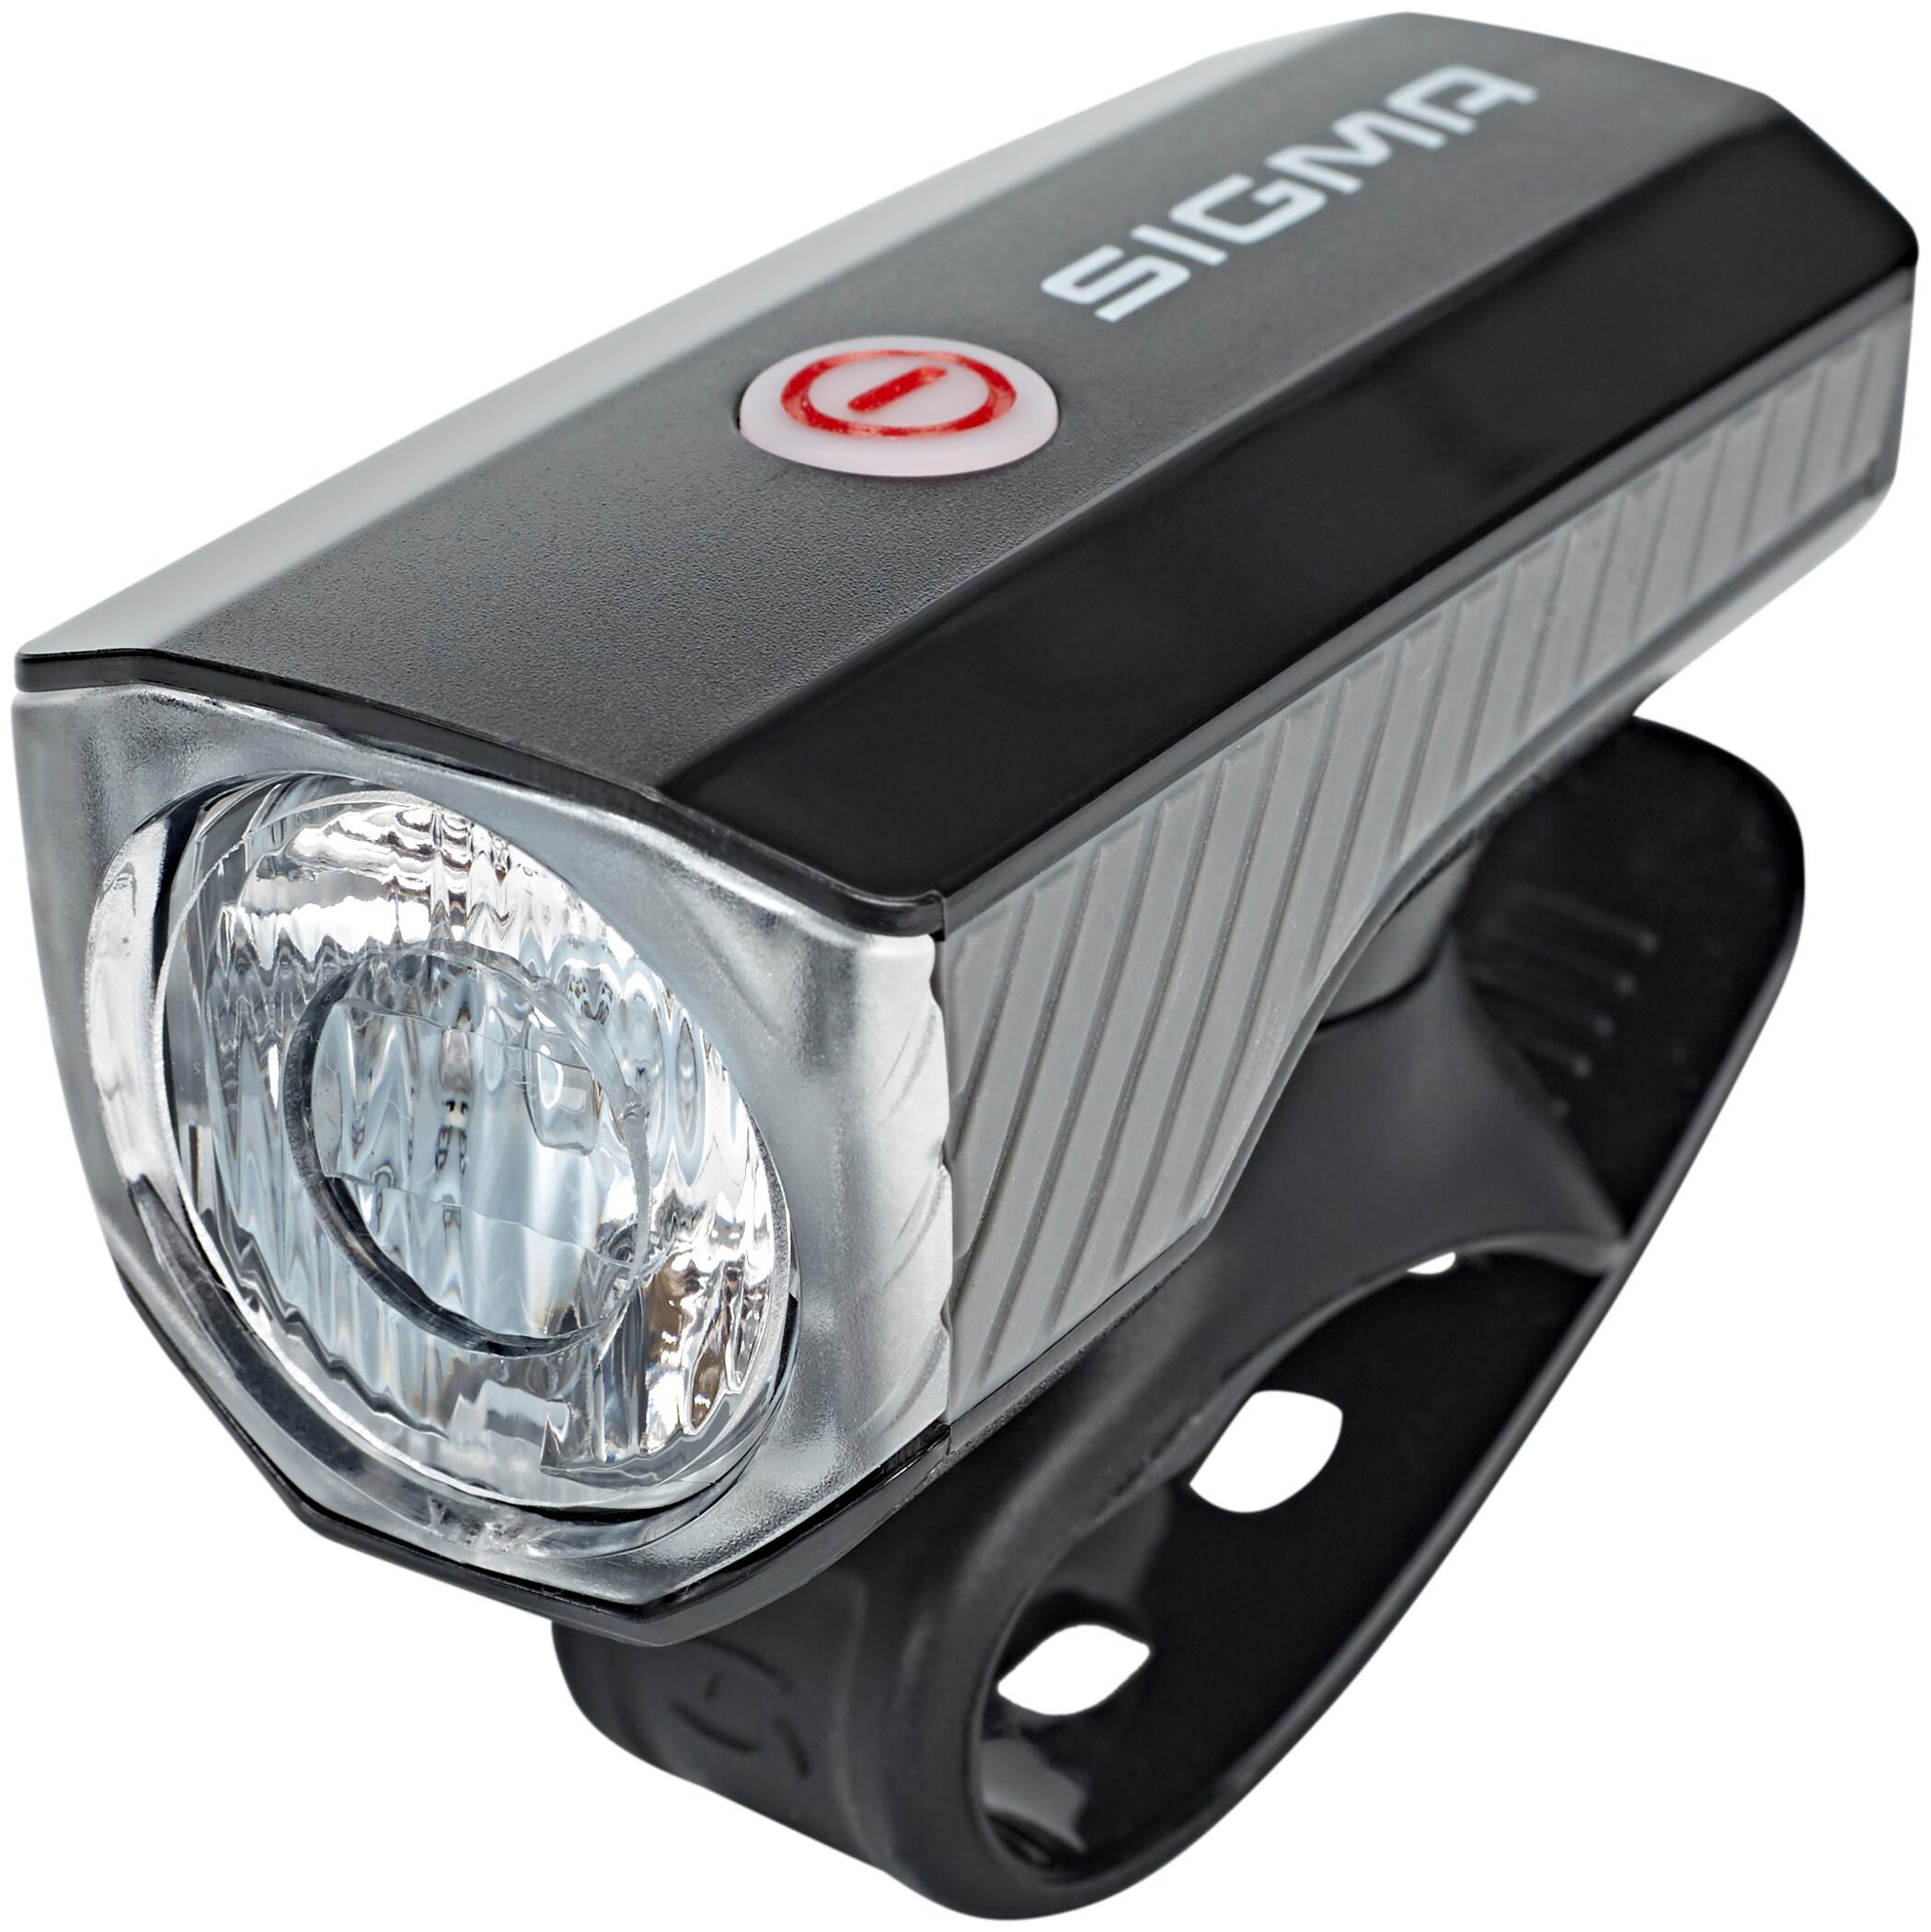 Tv, Video & Audio Showtec Xenon 4000 Lampe Hohe QualitäT Und Preiswert